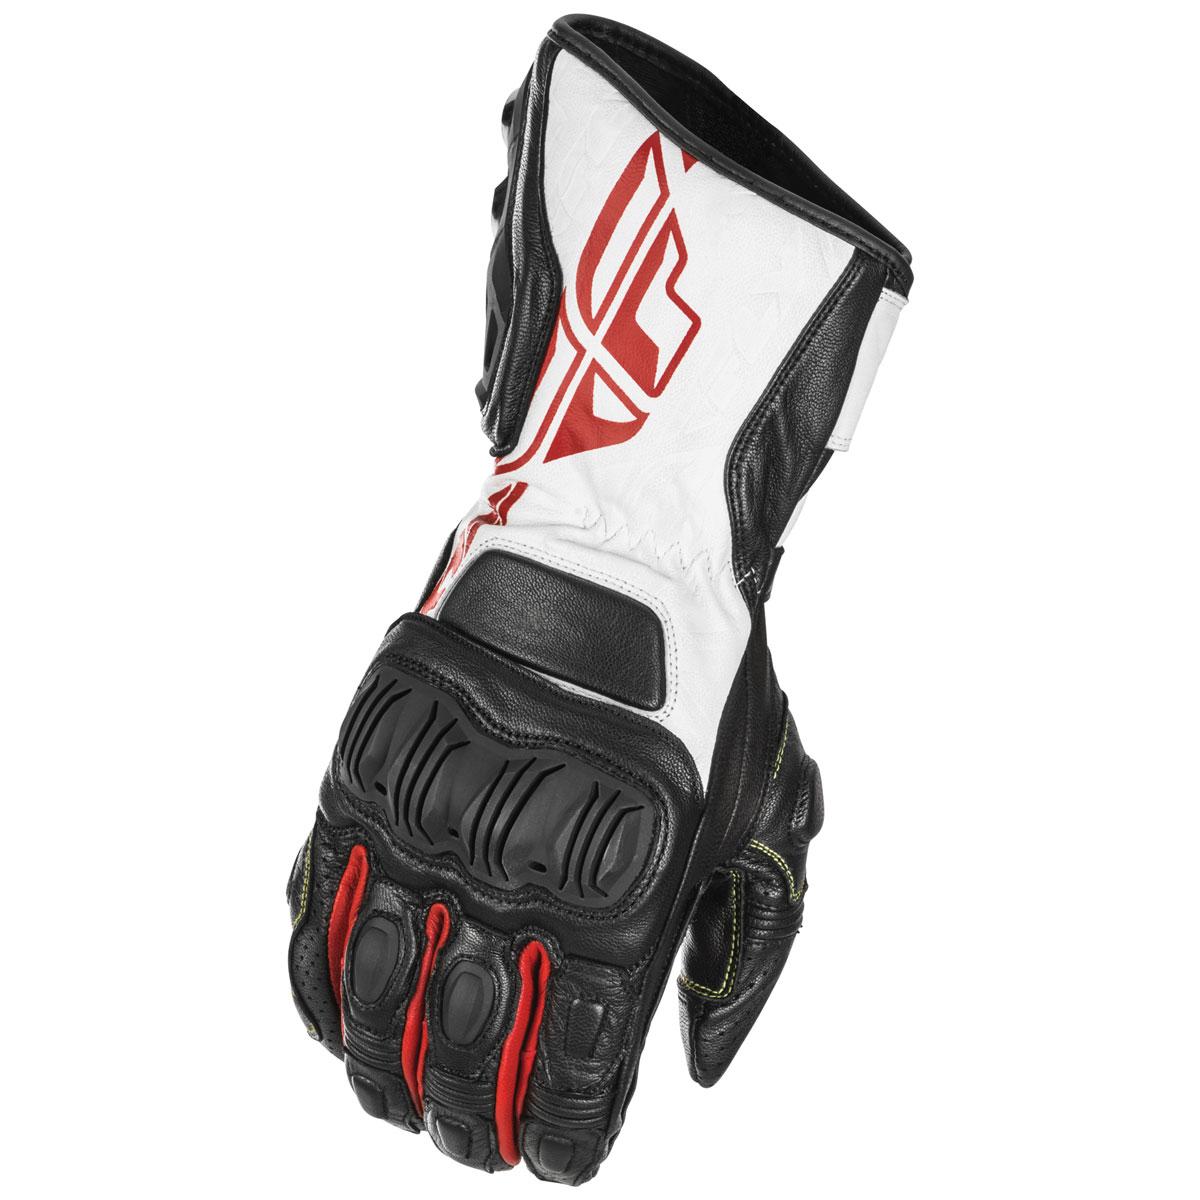 FLY Racing Street Men's FL-2 Black/White/Red Leather Gloves